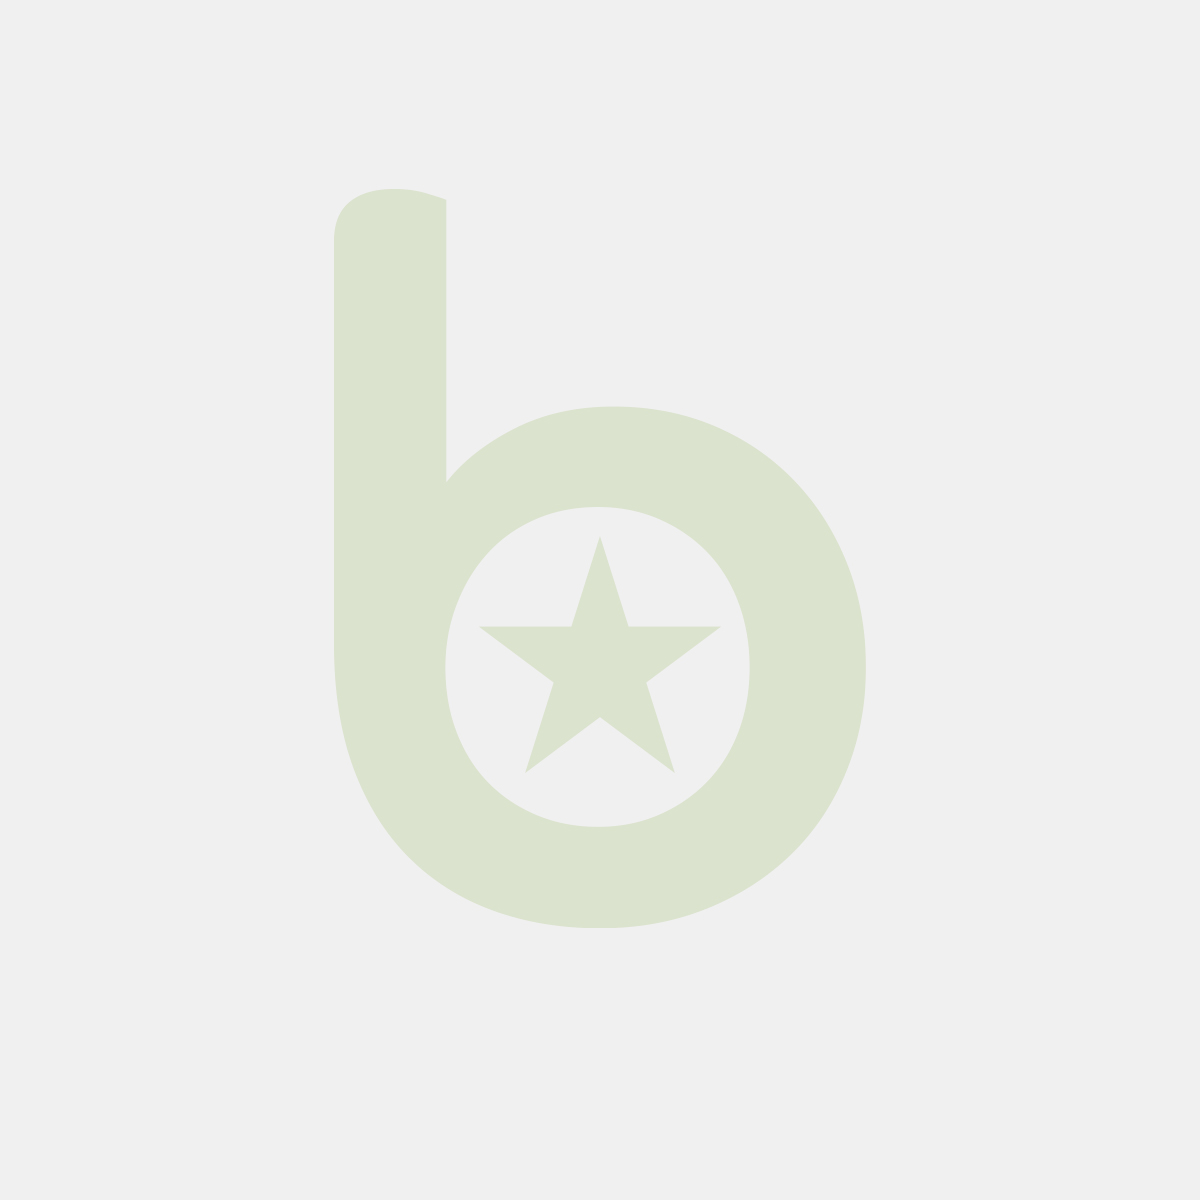 FINGERFOOD - kubek BAMBOO transparent 60ml fi.4,3xh.8cm op. 25 sztuk